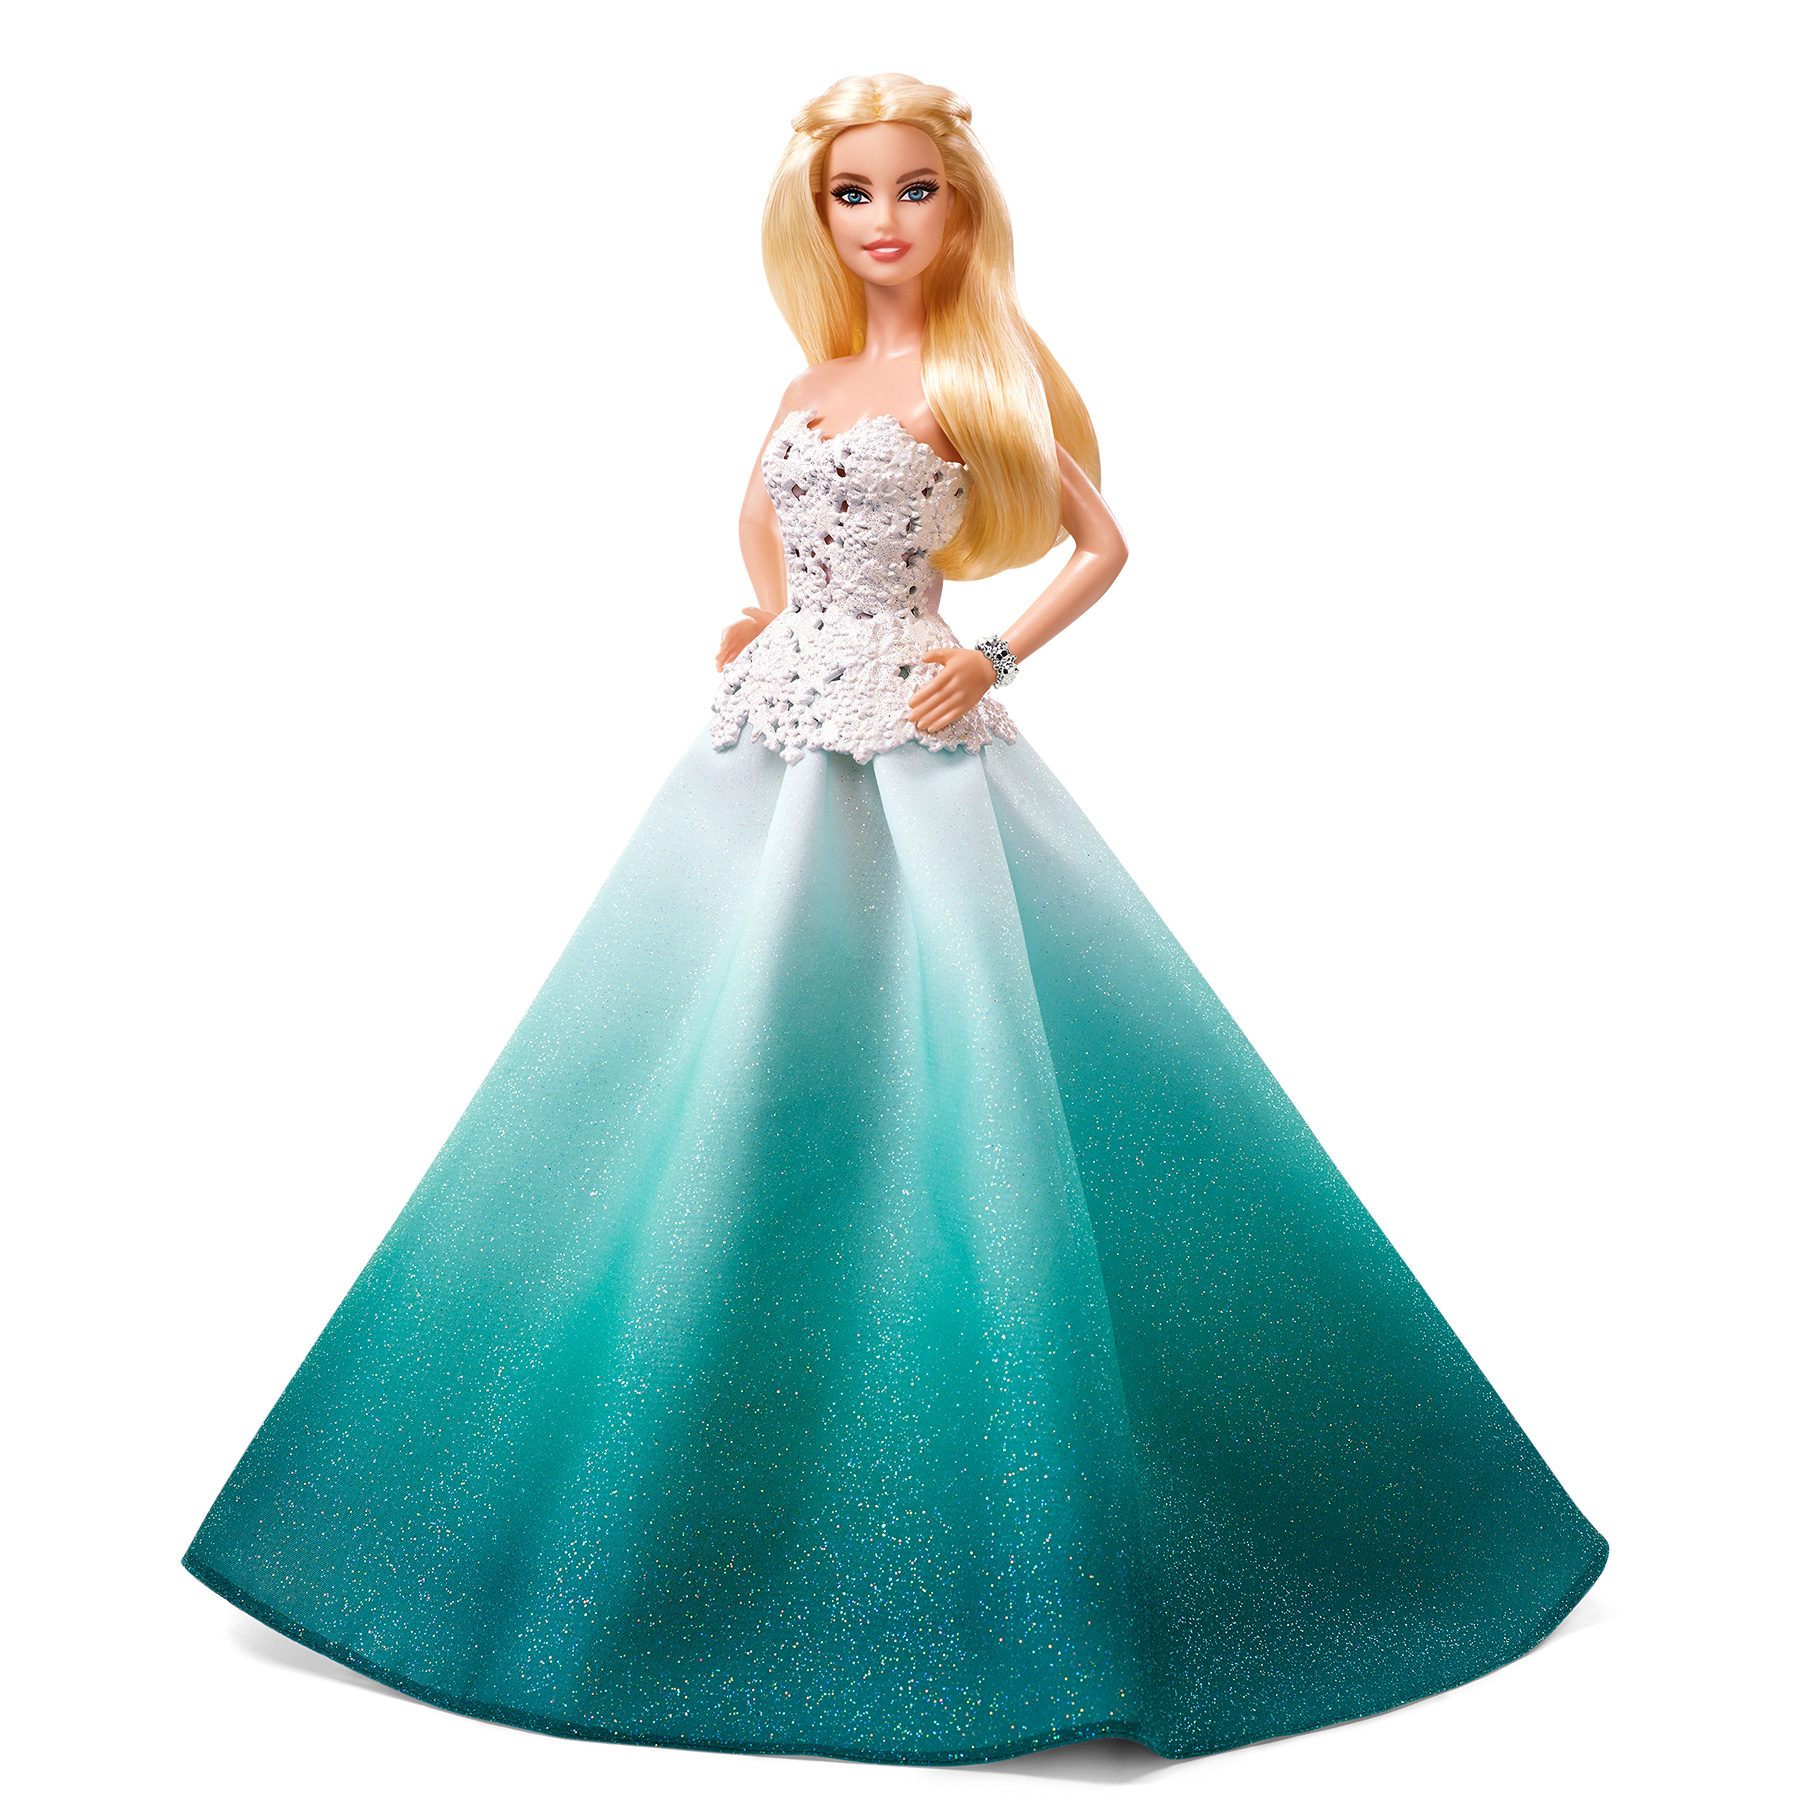 Barbie Fashion Dress Makeup Games